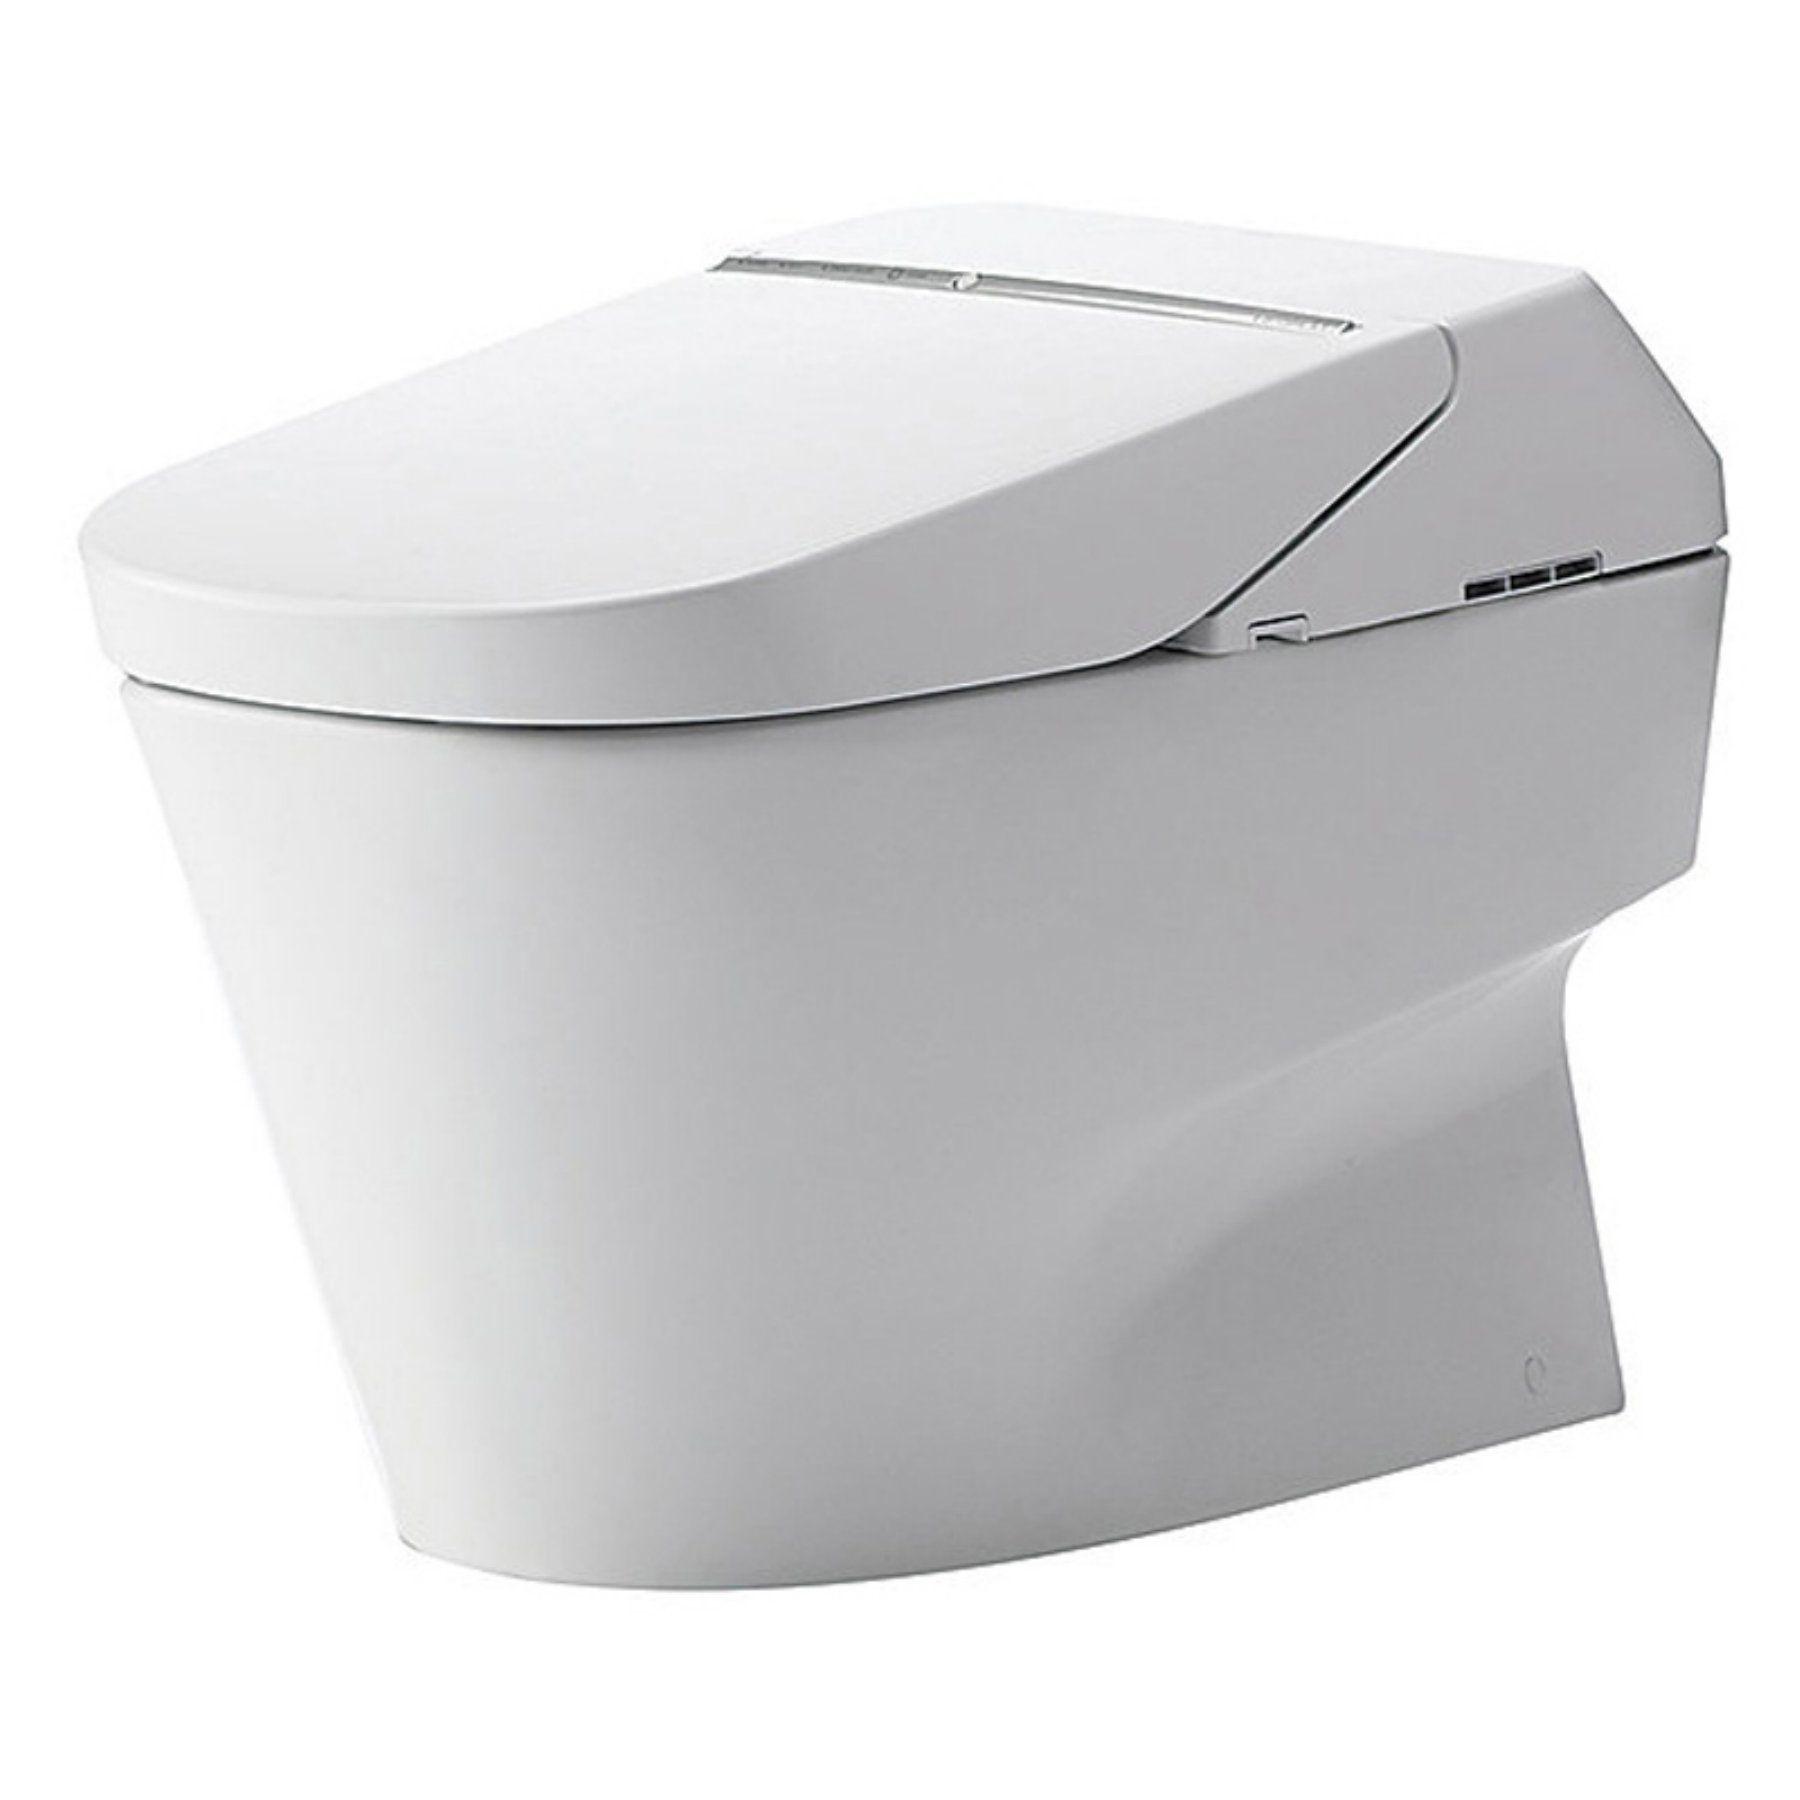 Toto Neorest MS992CUMFG#01 Elongated 1 Piece Toilet - MS992CUMFG01 ...